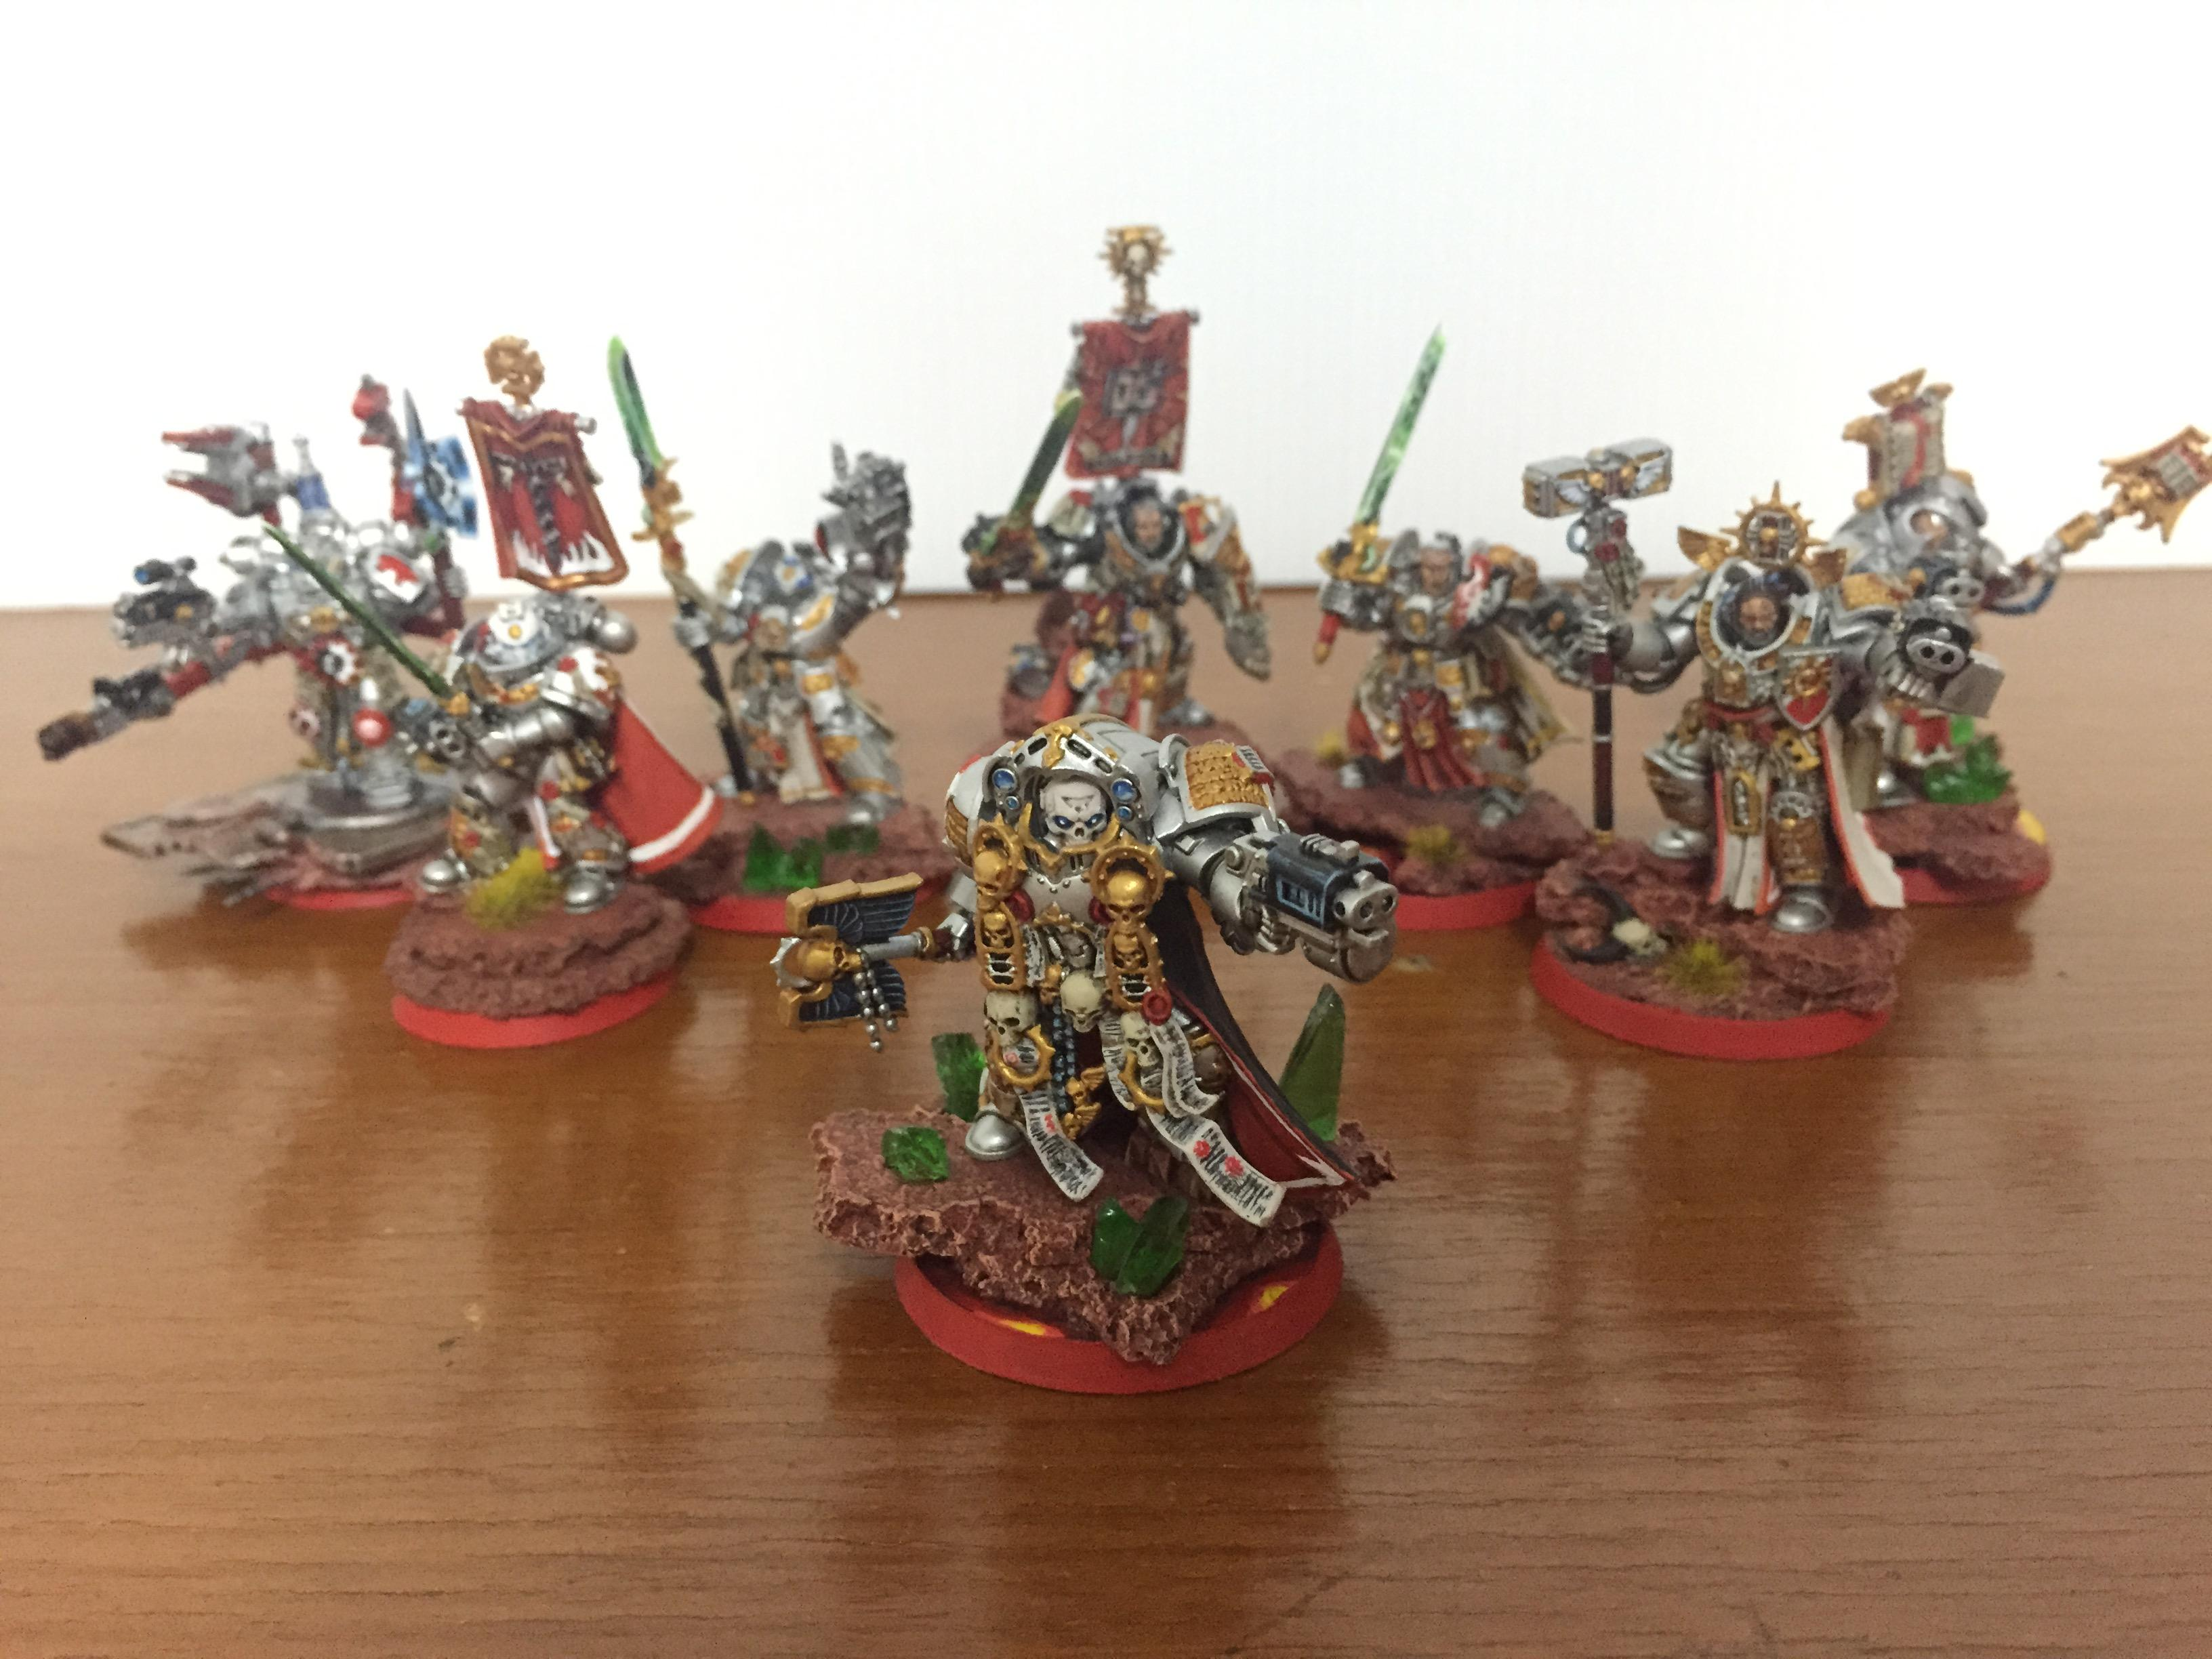 Captain, Chaplain, Crowe, Draigo, Grey Knights, Librarian, Stern, Techmarine, Voldus